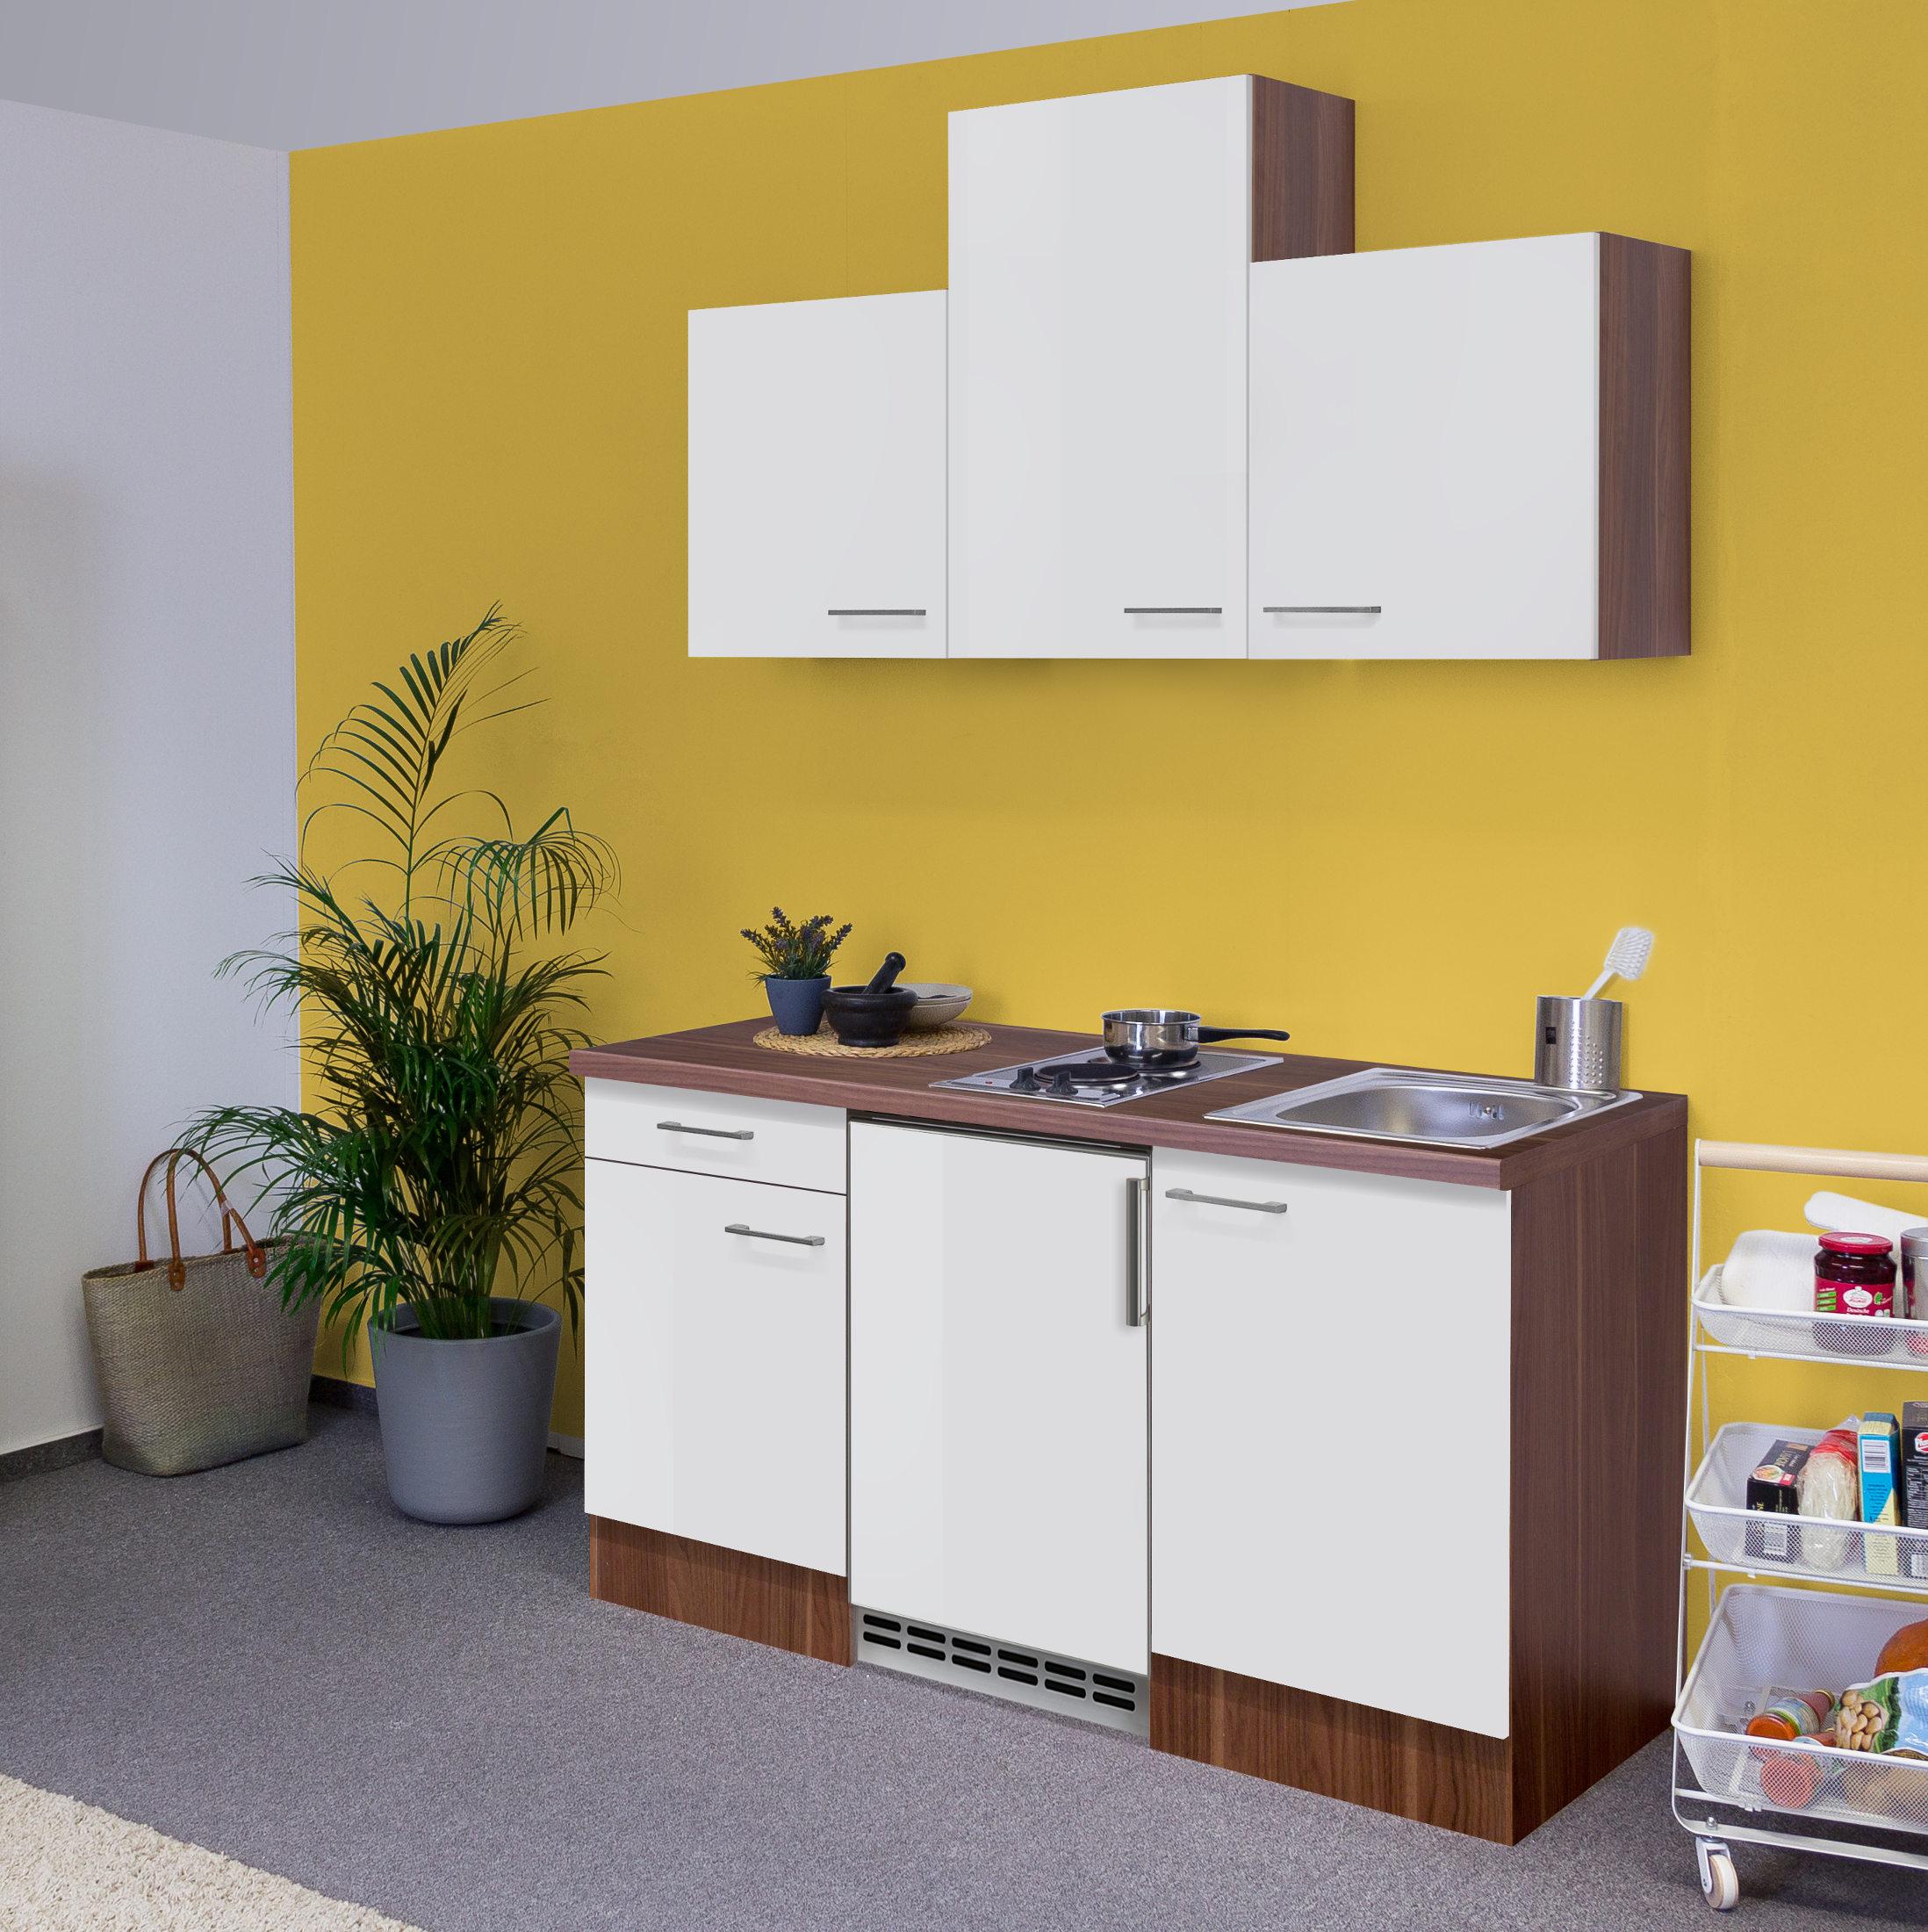 k chen sp lenunterschrank cosmo 1 t rig 50 cm breit perlmutt wei k che sp lenschr nke. Black Bedroom Furniture Sets. Home Design Ideas